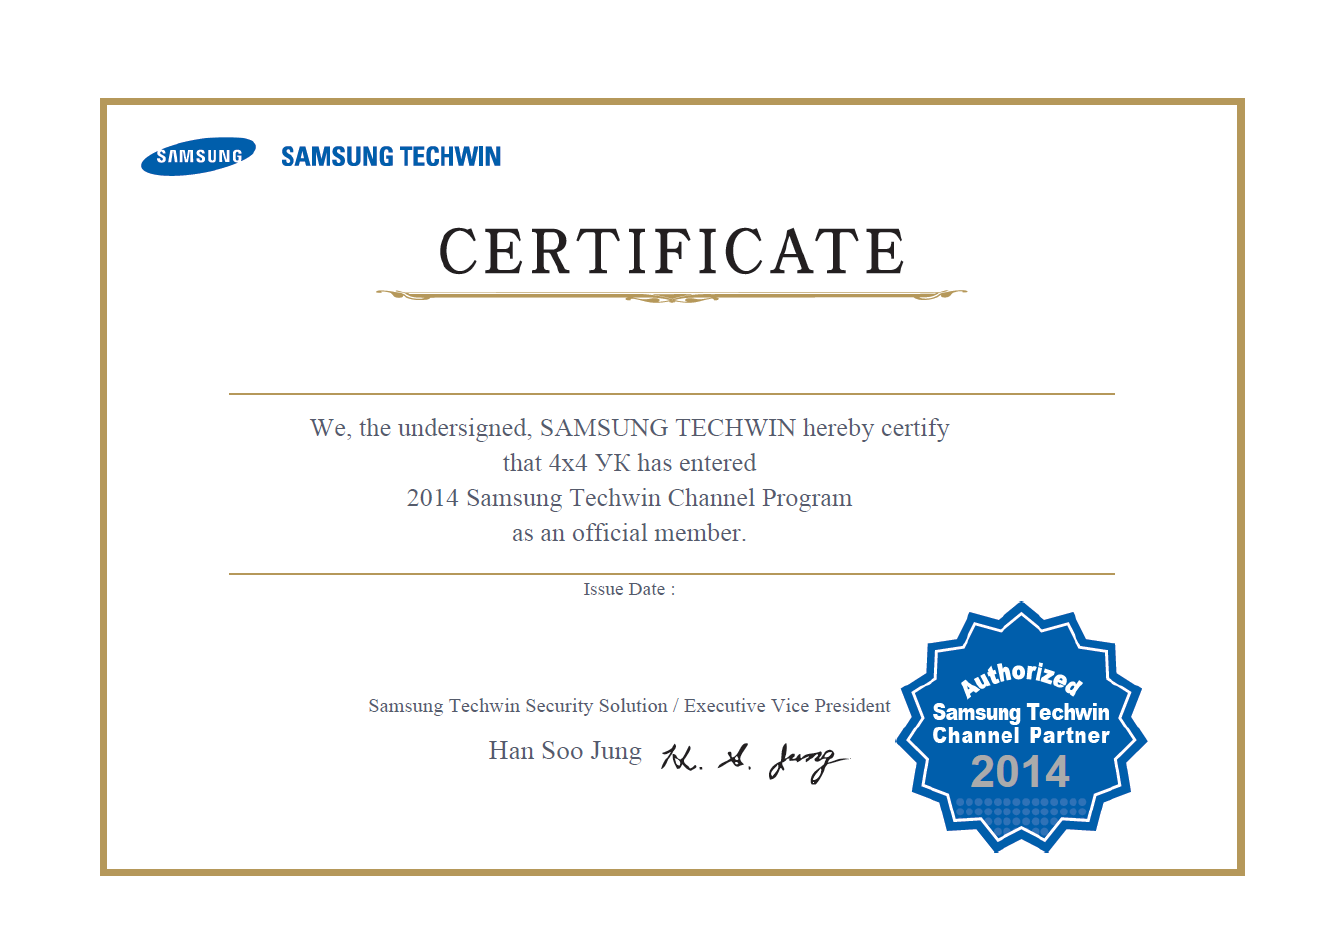 Certificate 4x4 Samsung Techwin Channel Partner 2014